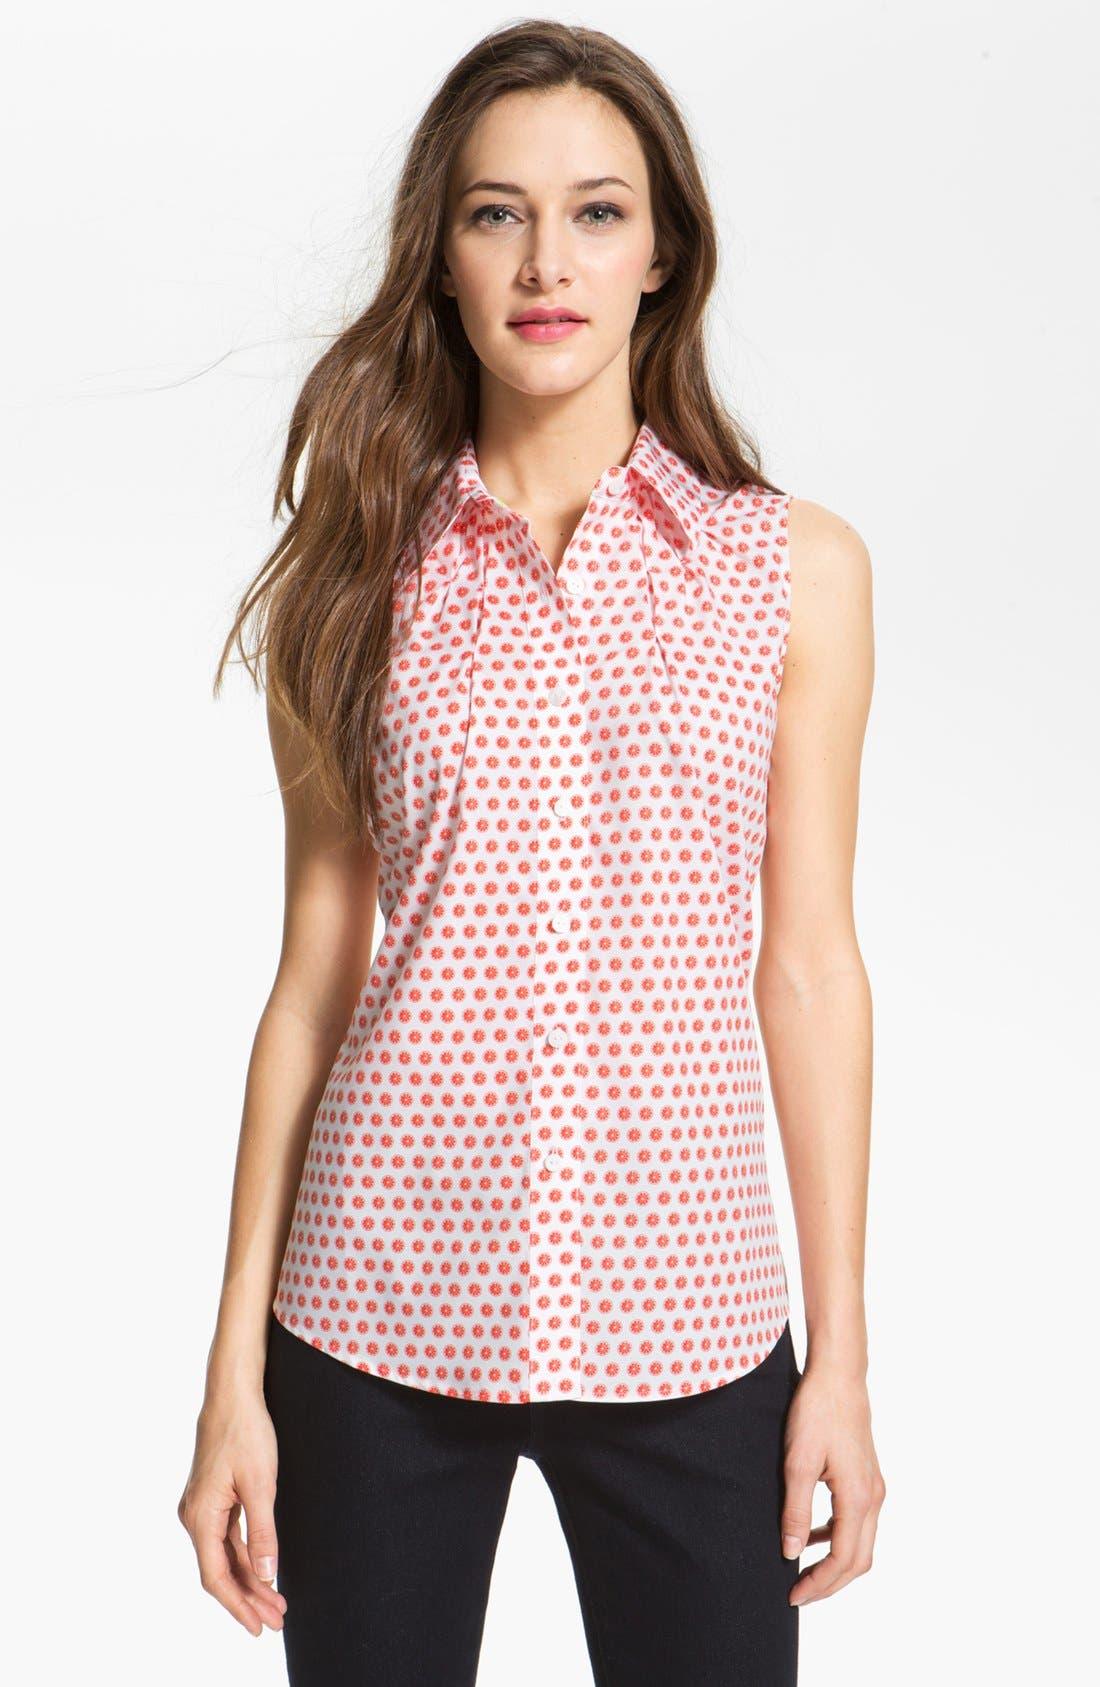 Alternate Image 1 Selected - Foxcroft 'Citrus Dot' Sleeveless Shirt (Petite)